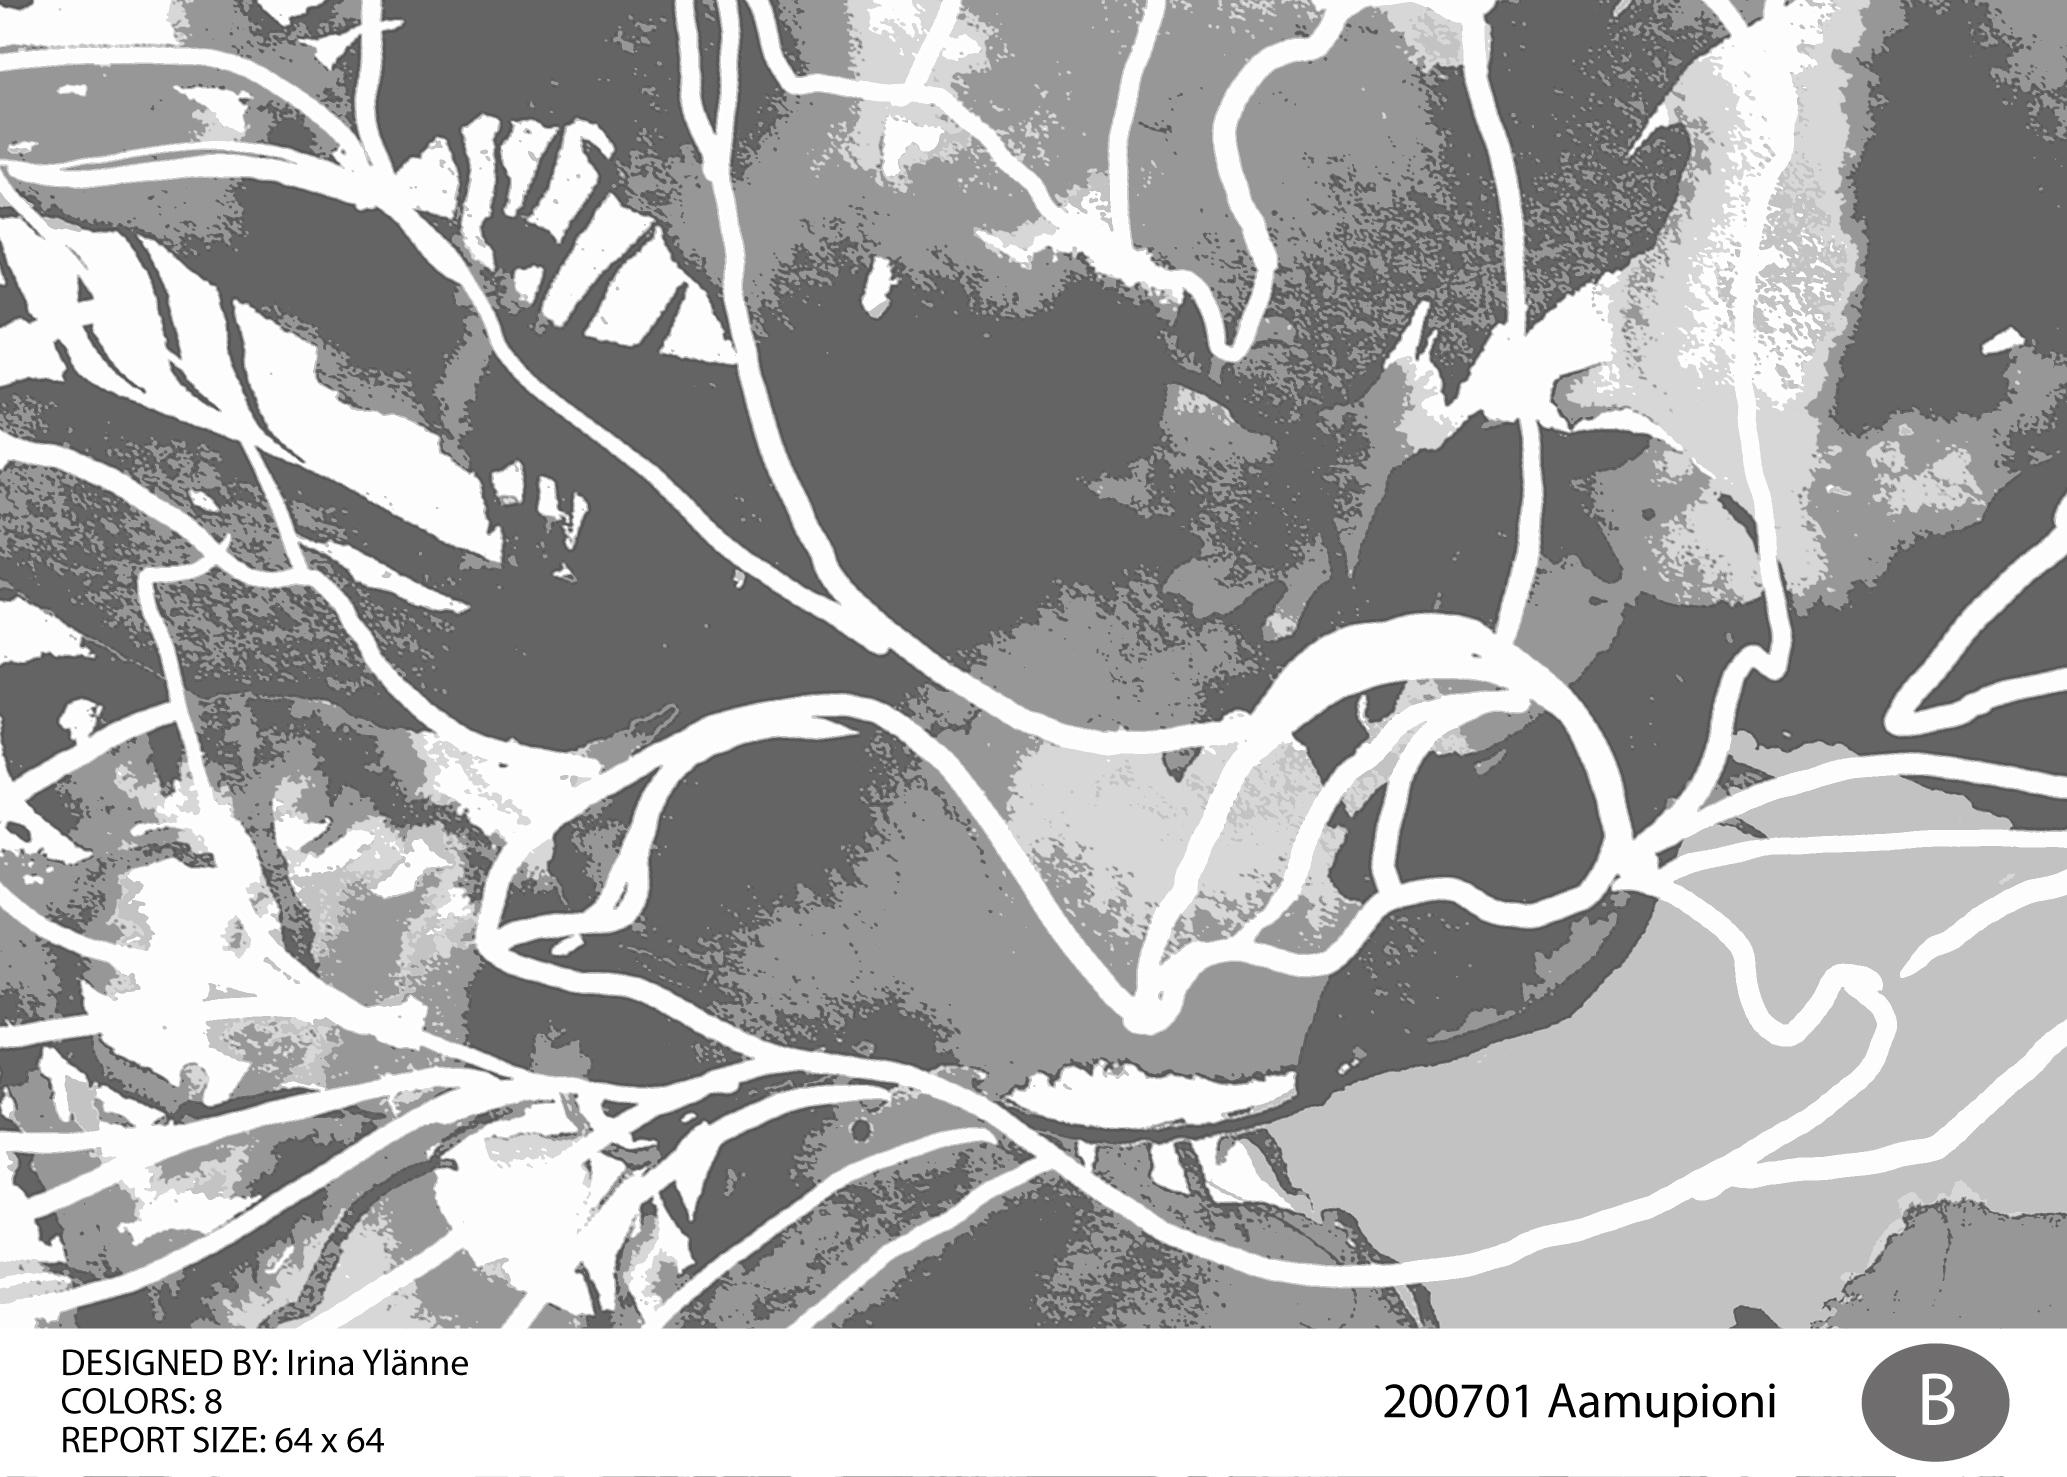 irinas_200701_aamupioni-01